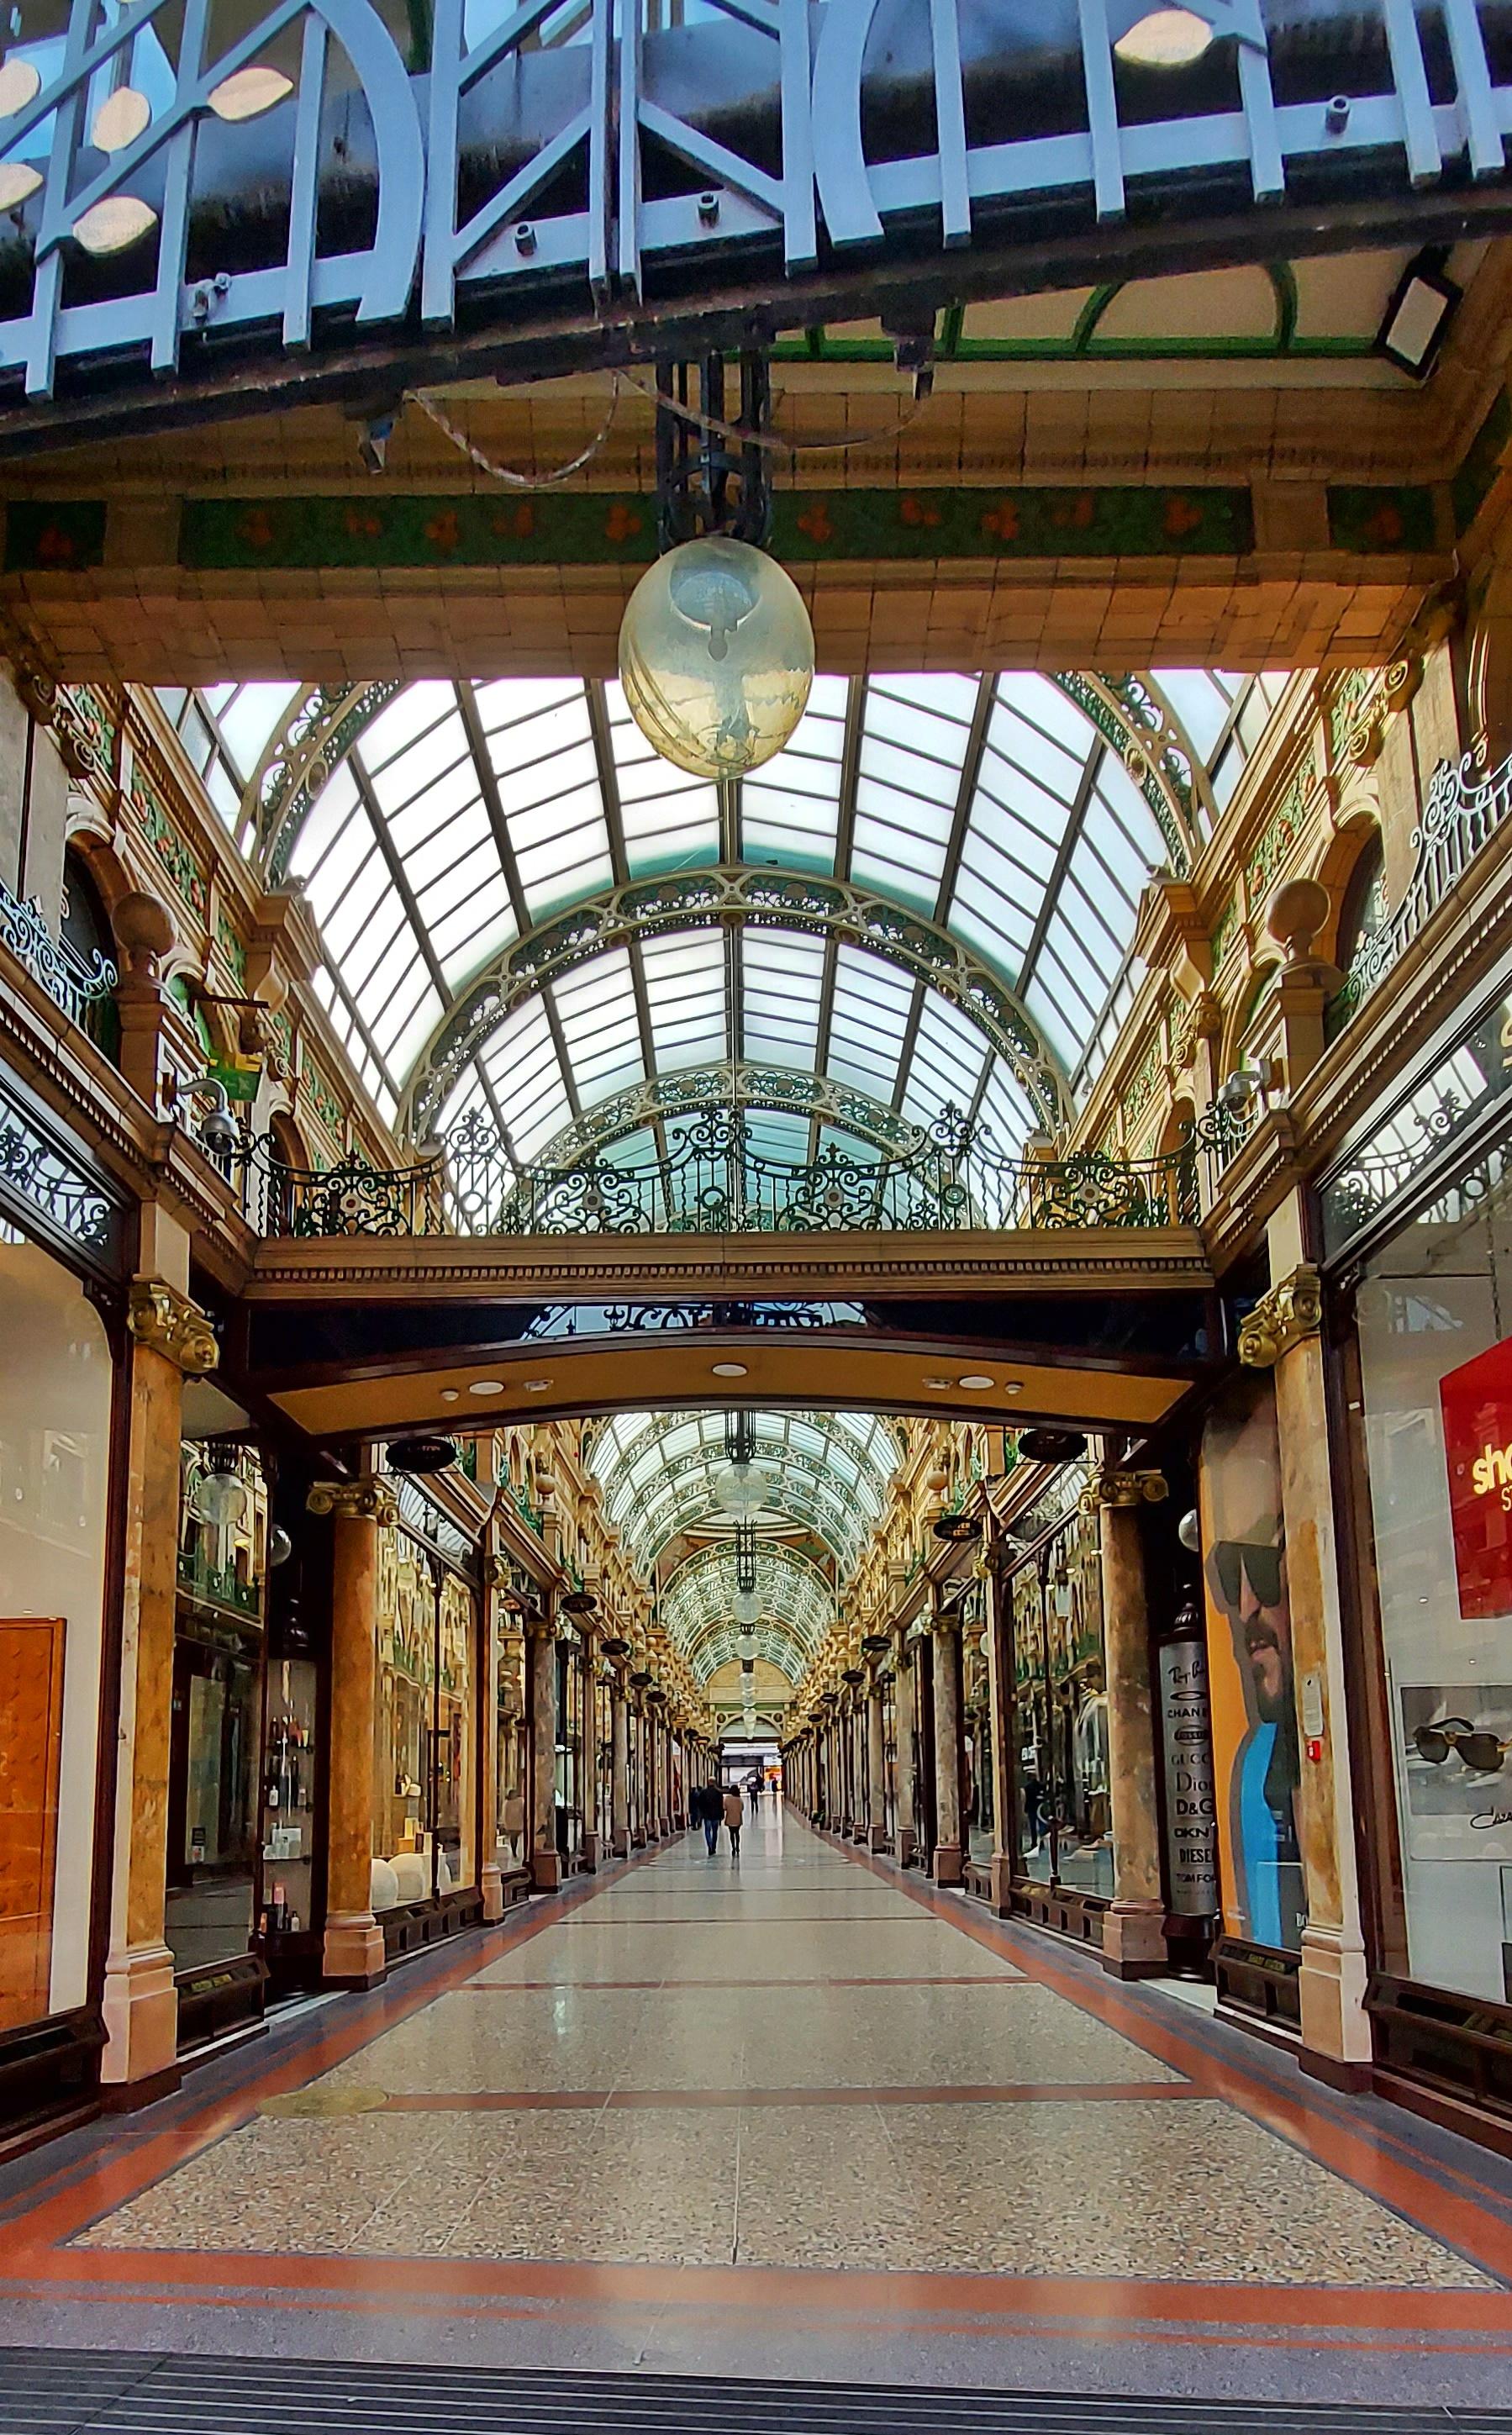 Leeds County Arcade